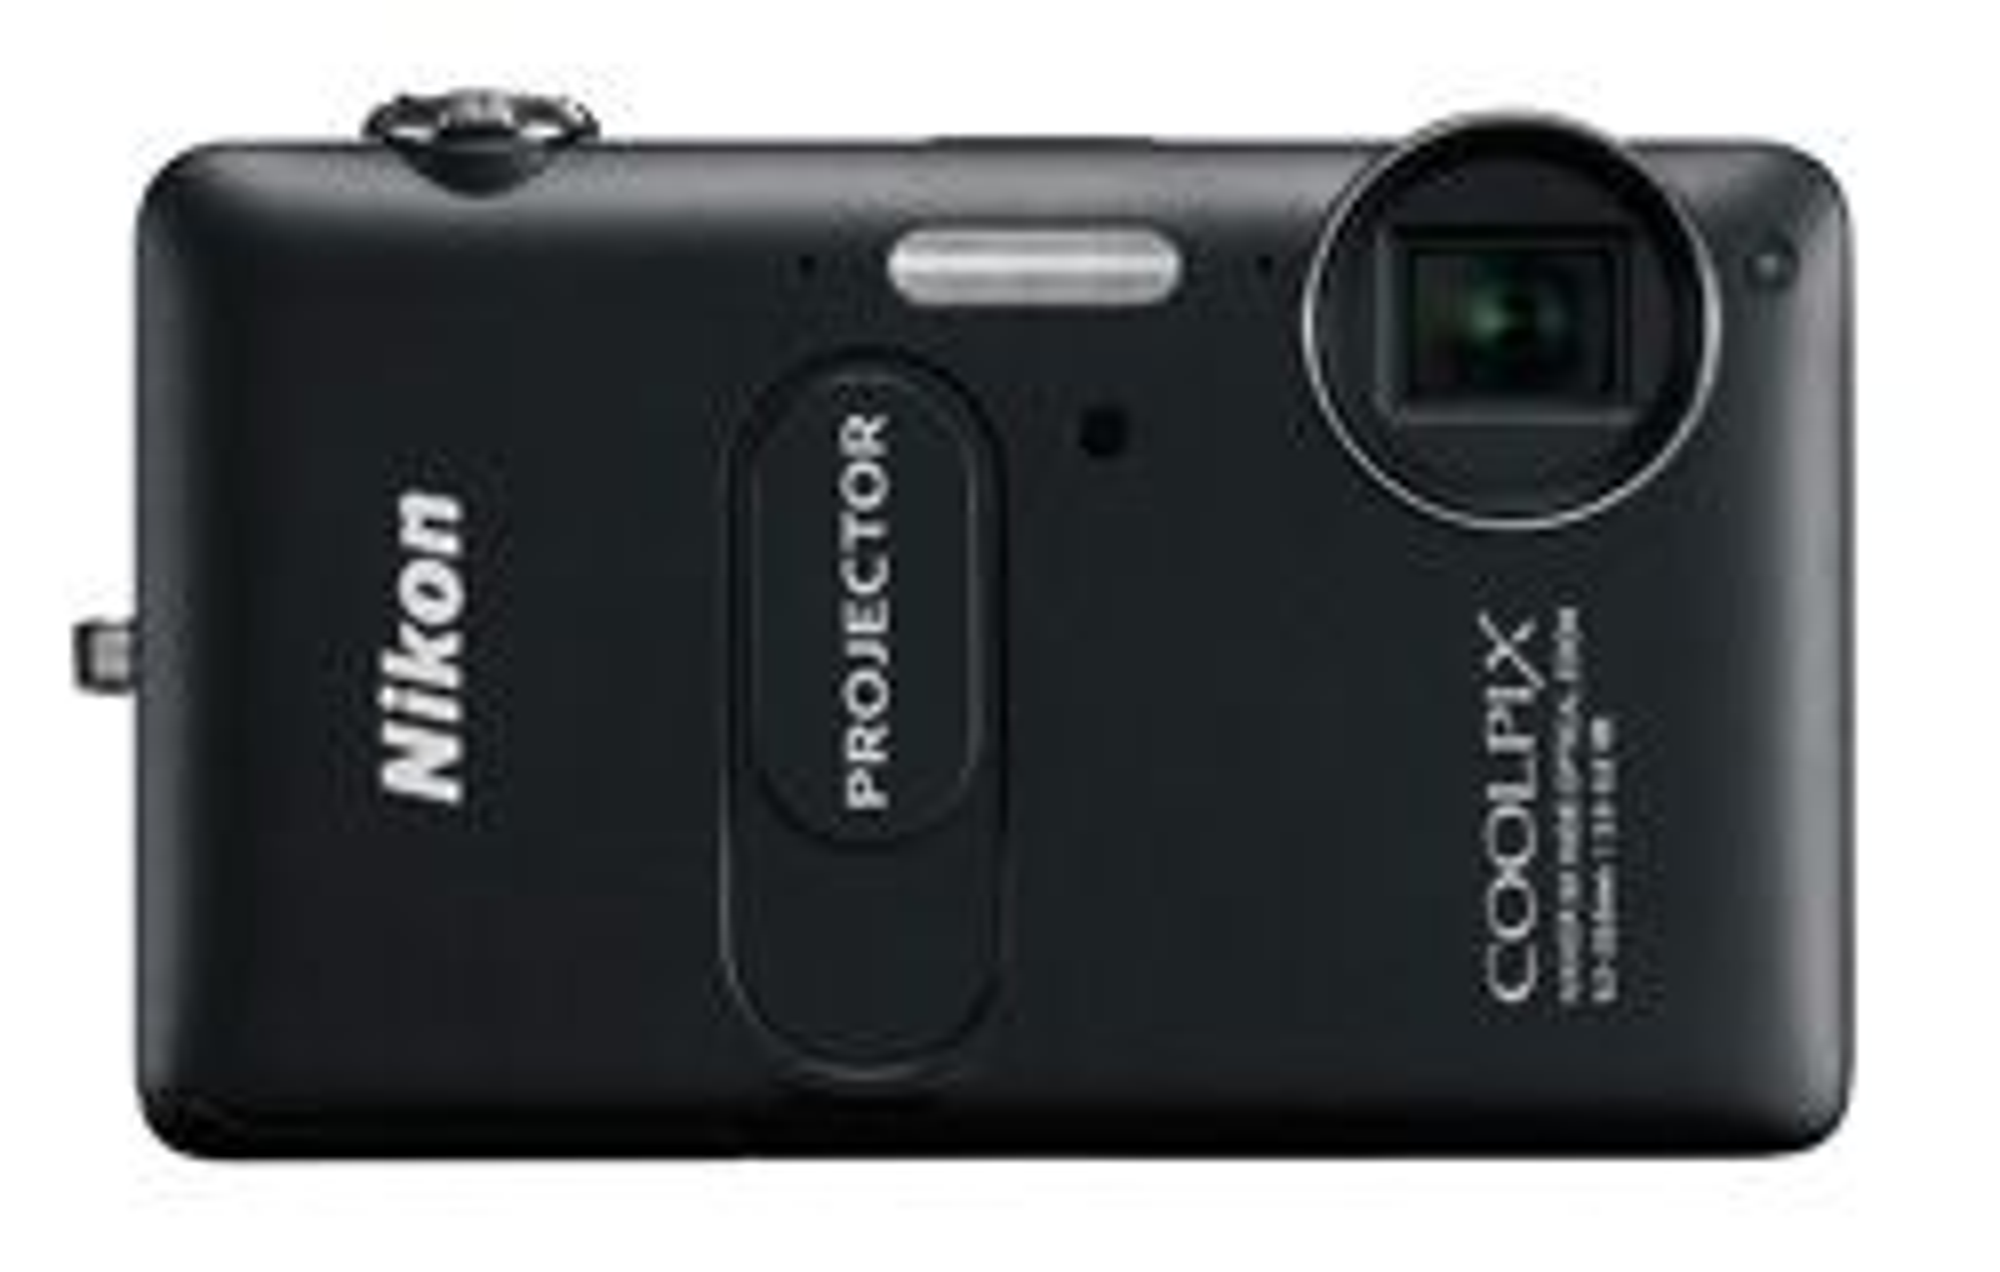 Nikon Coolpix S1200pj.